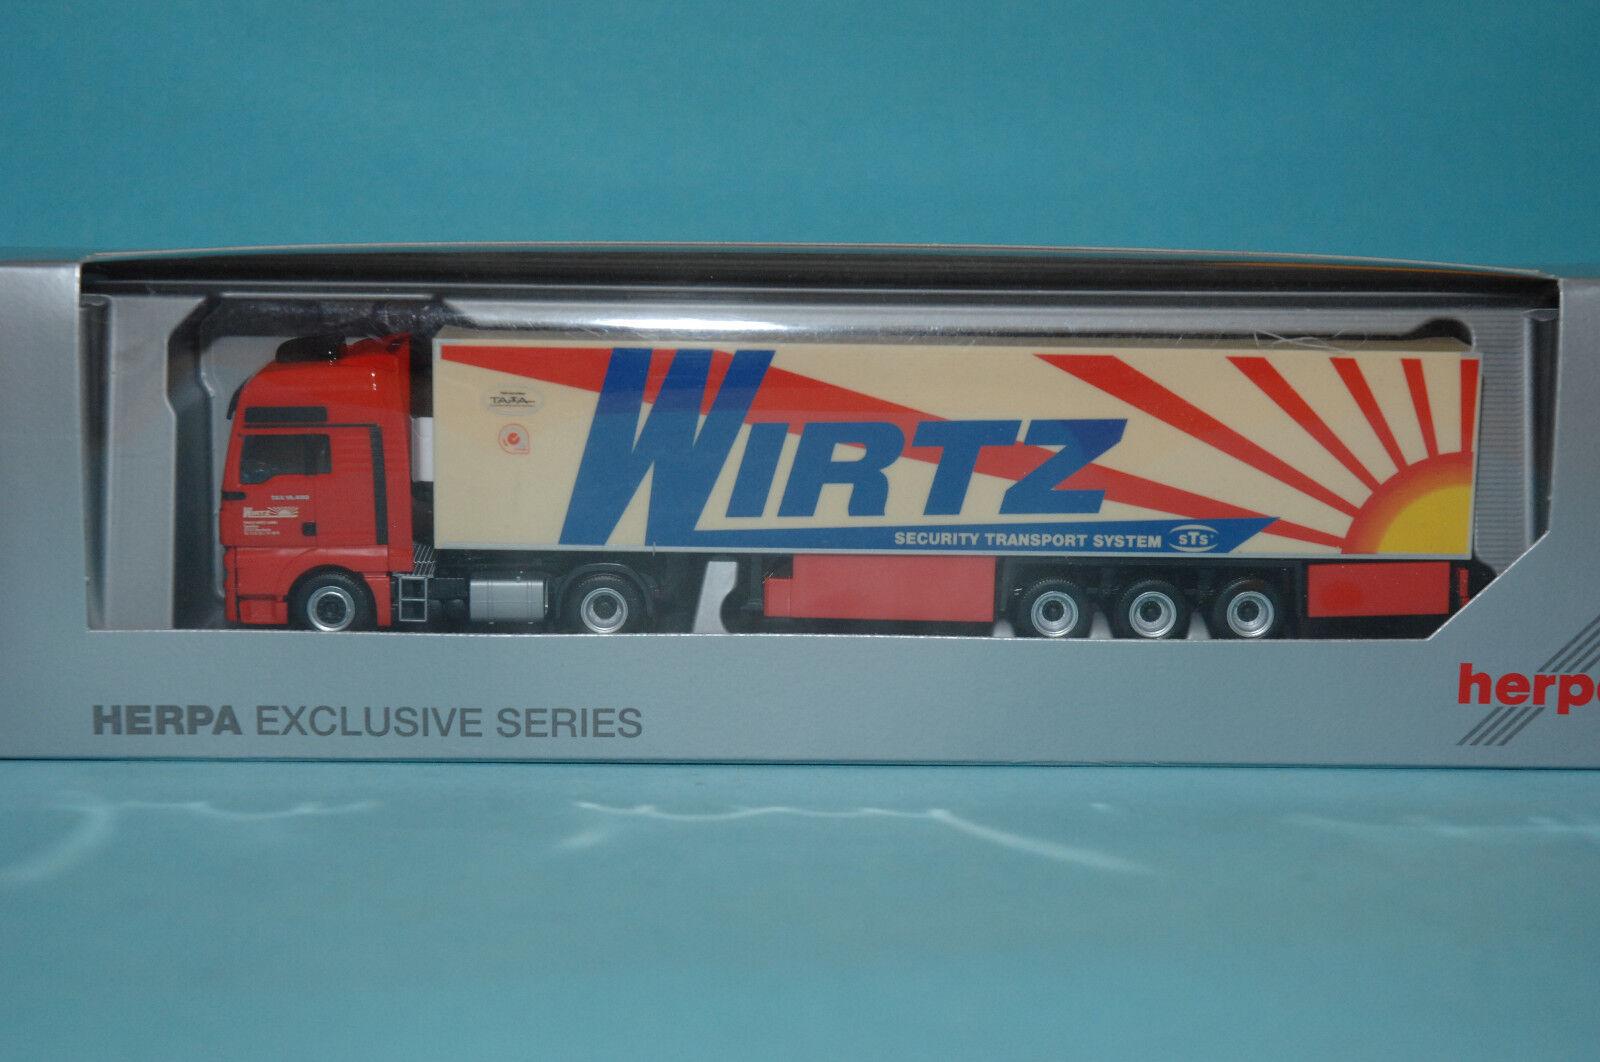 Herpa 926485 man tgx xxl articulated lorry 'wirtz  HO 1 87 new